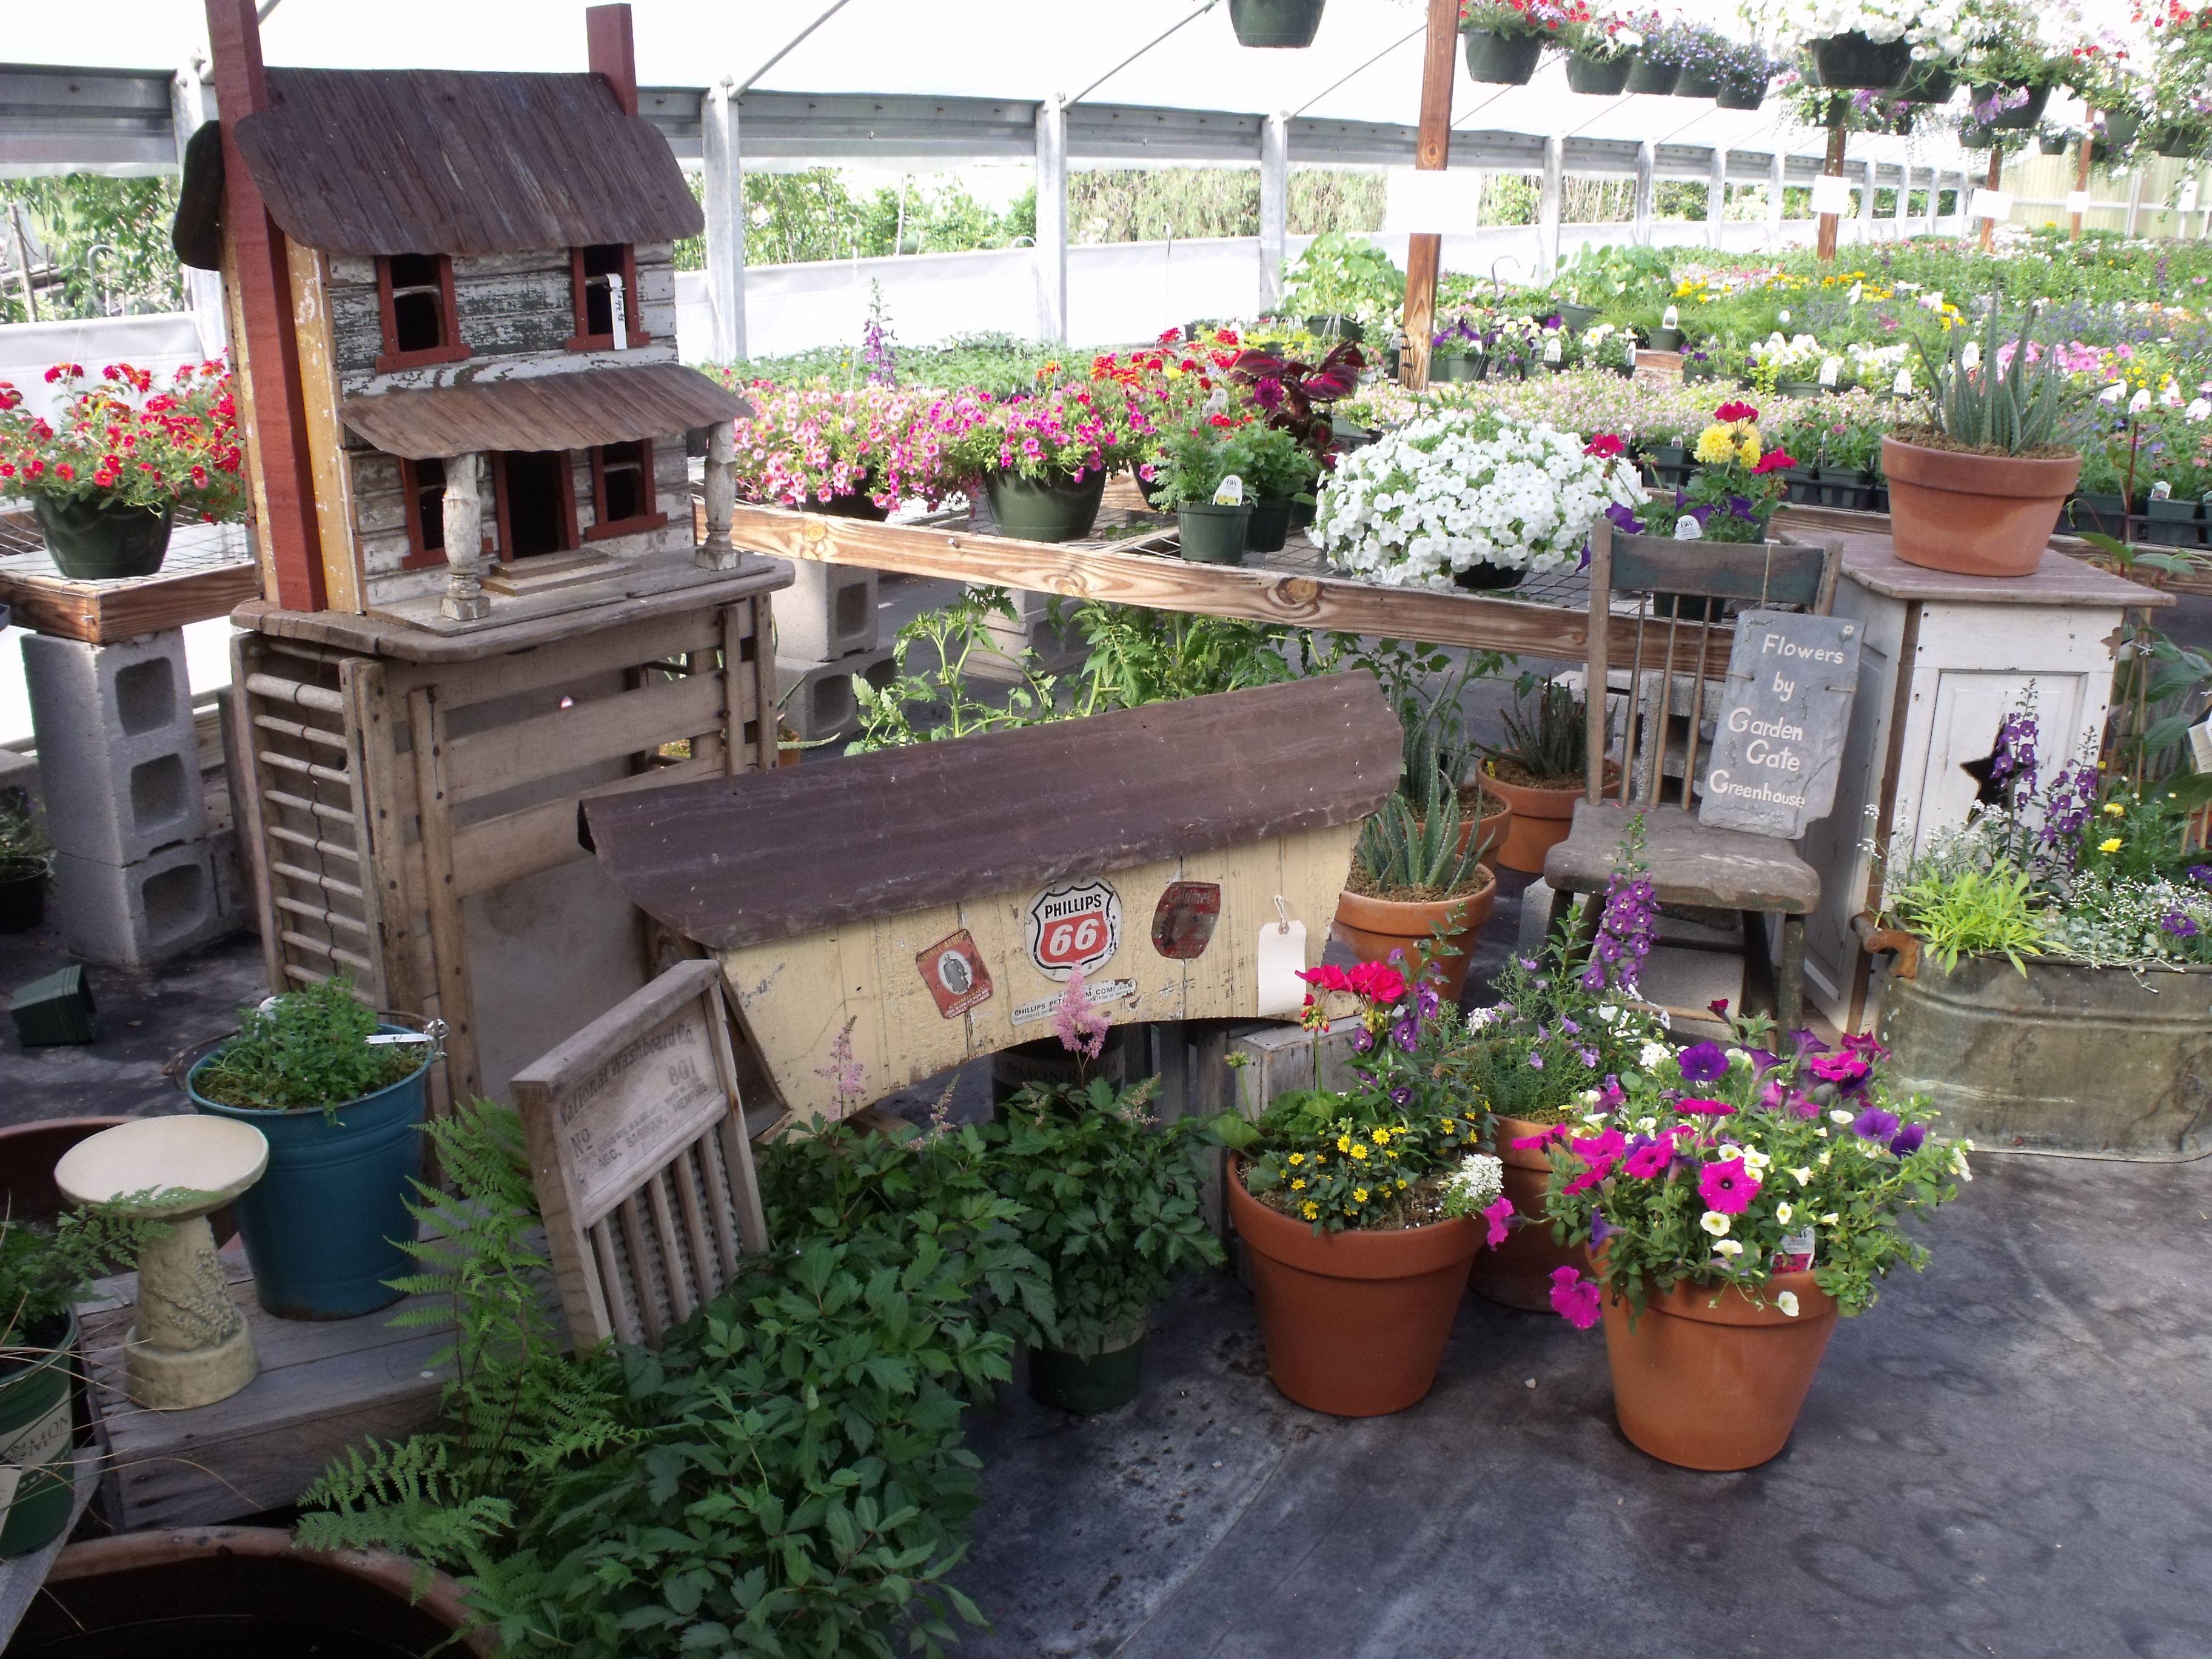 Pin by yvonne comier on primitive garden ideas pinterest for Garden design pinterest